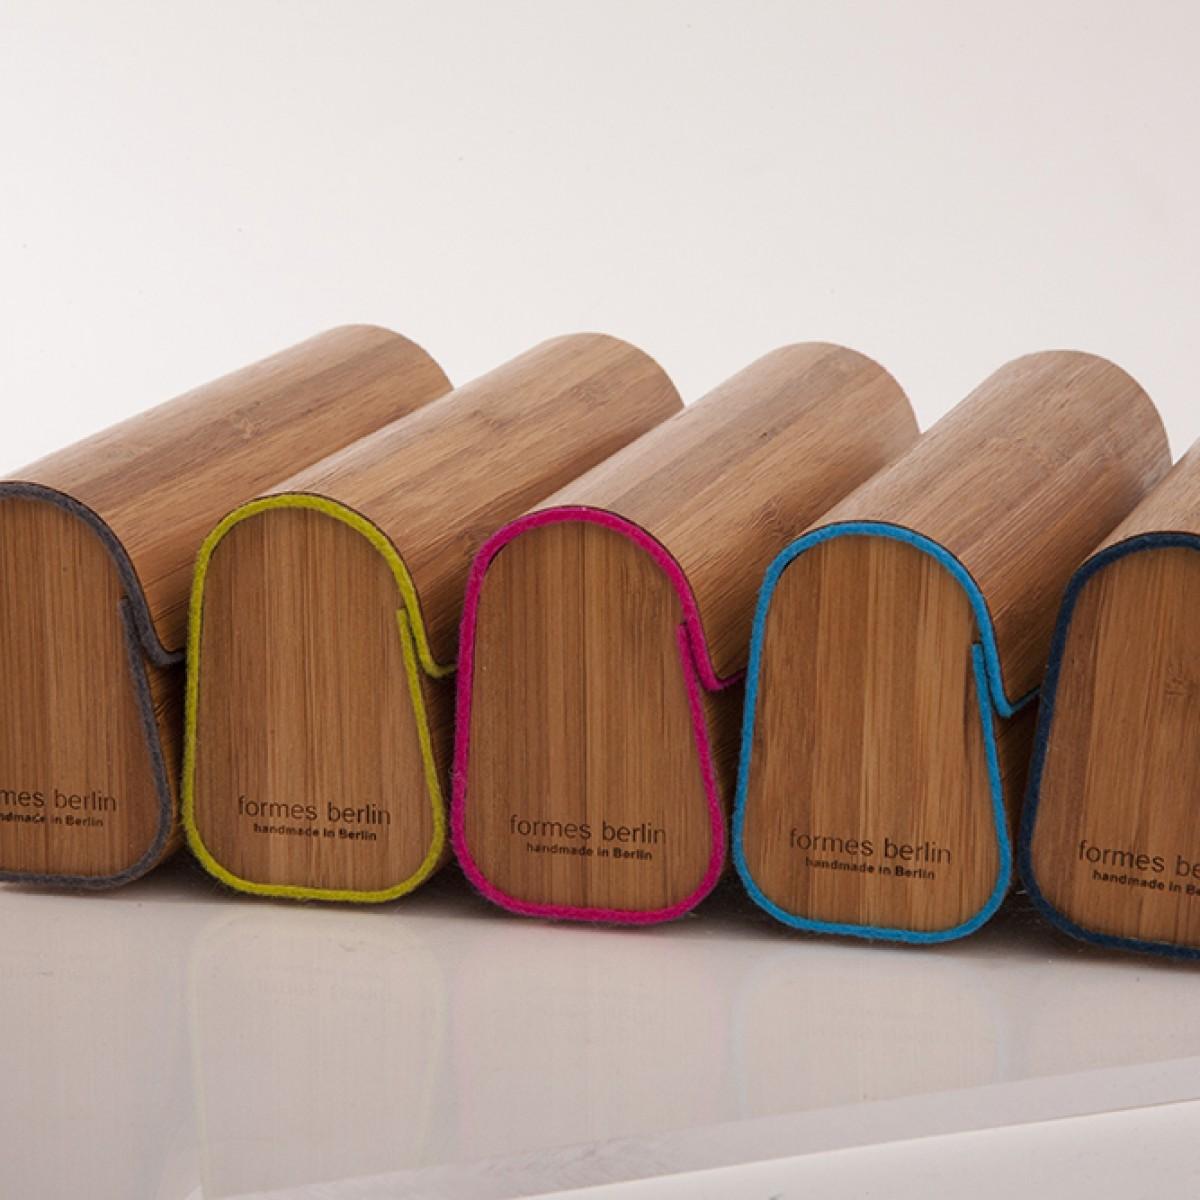 formes Berlin - Brillenetui aus Holzfurnier - gedämpfter Bambus grün